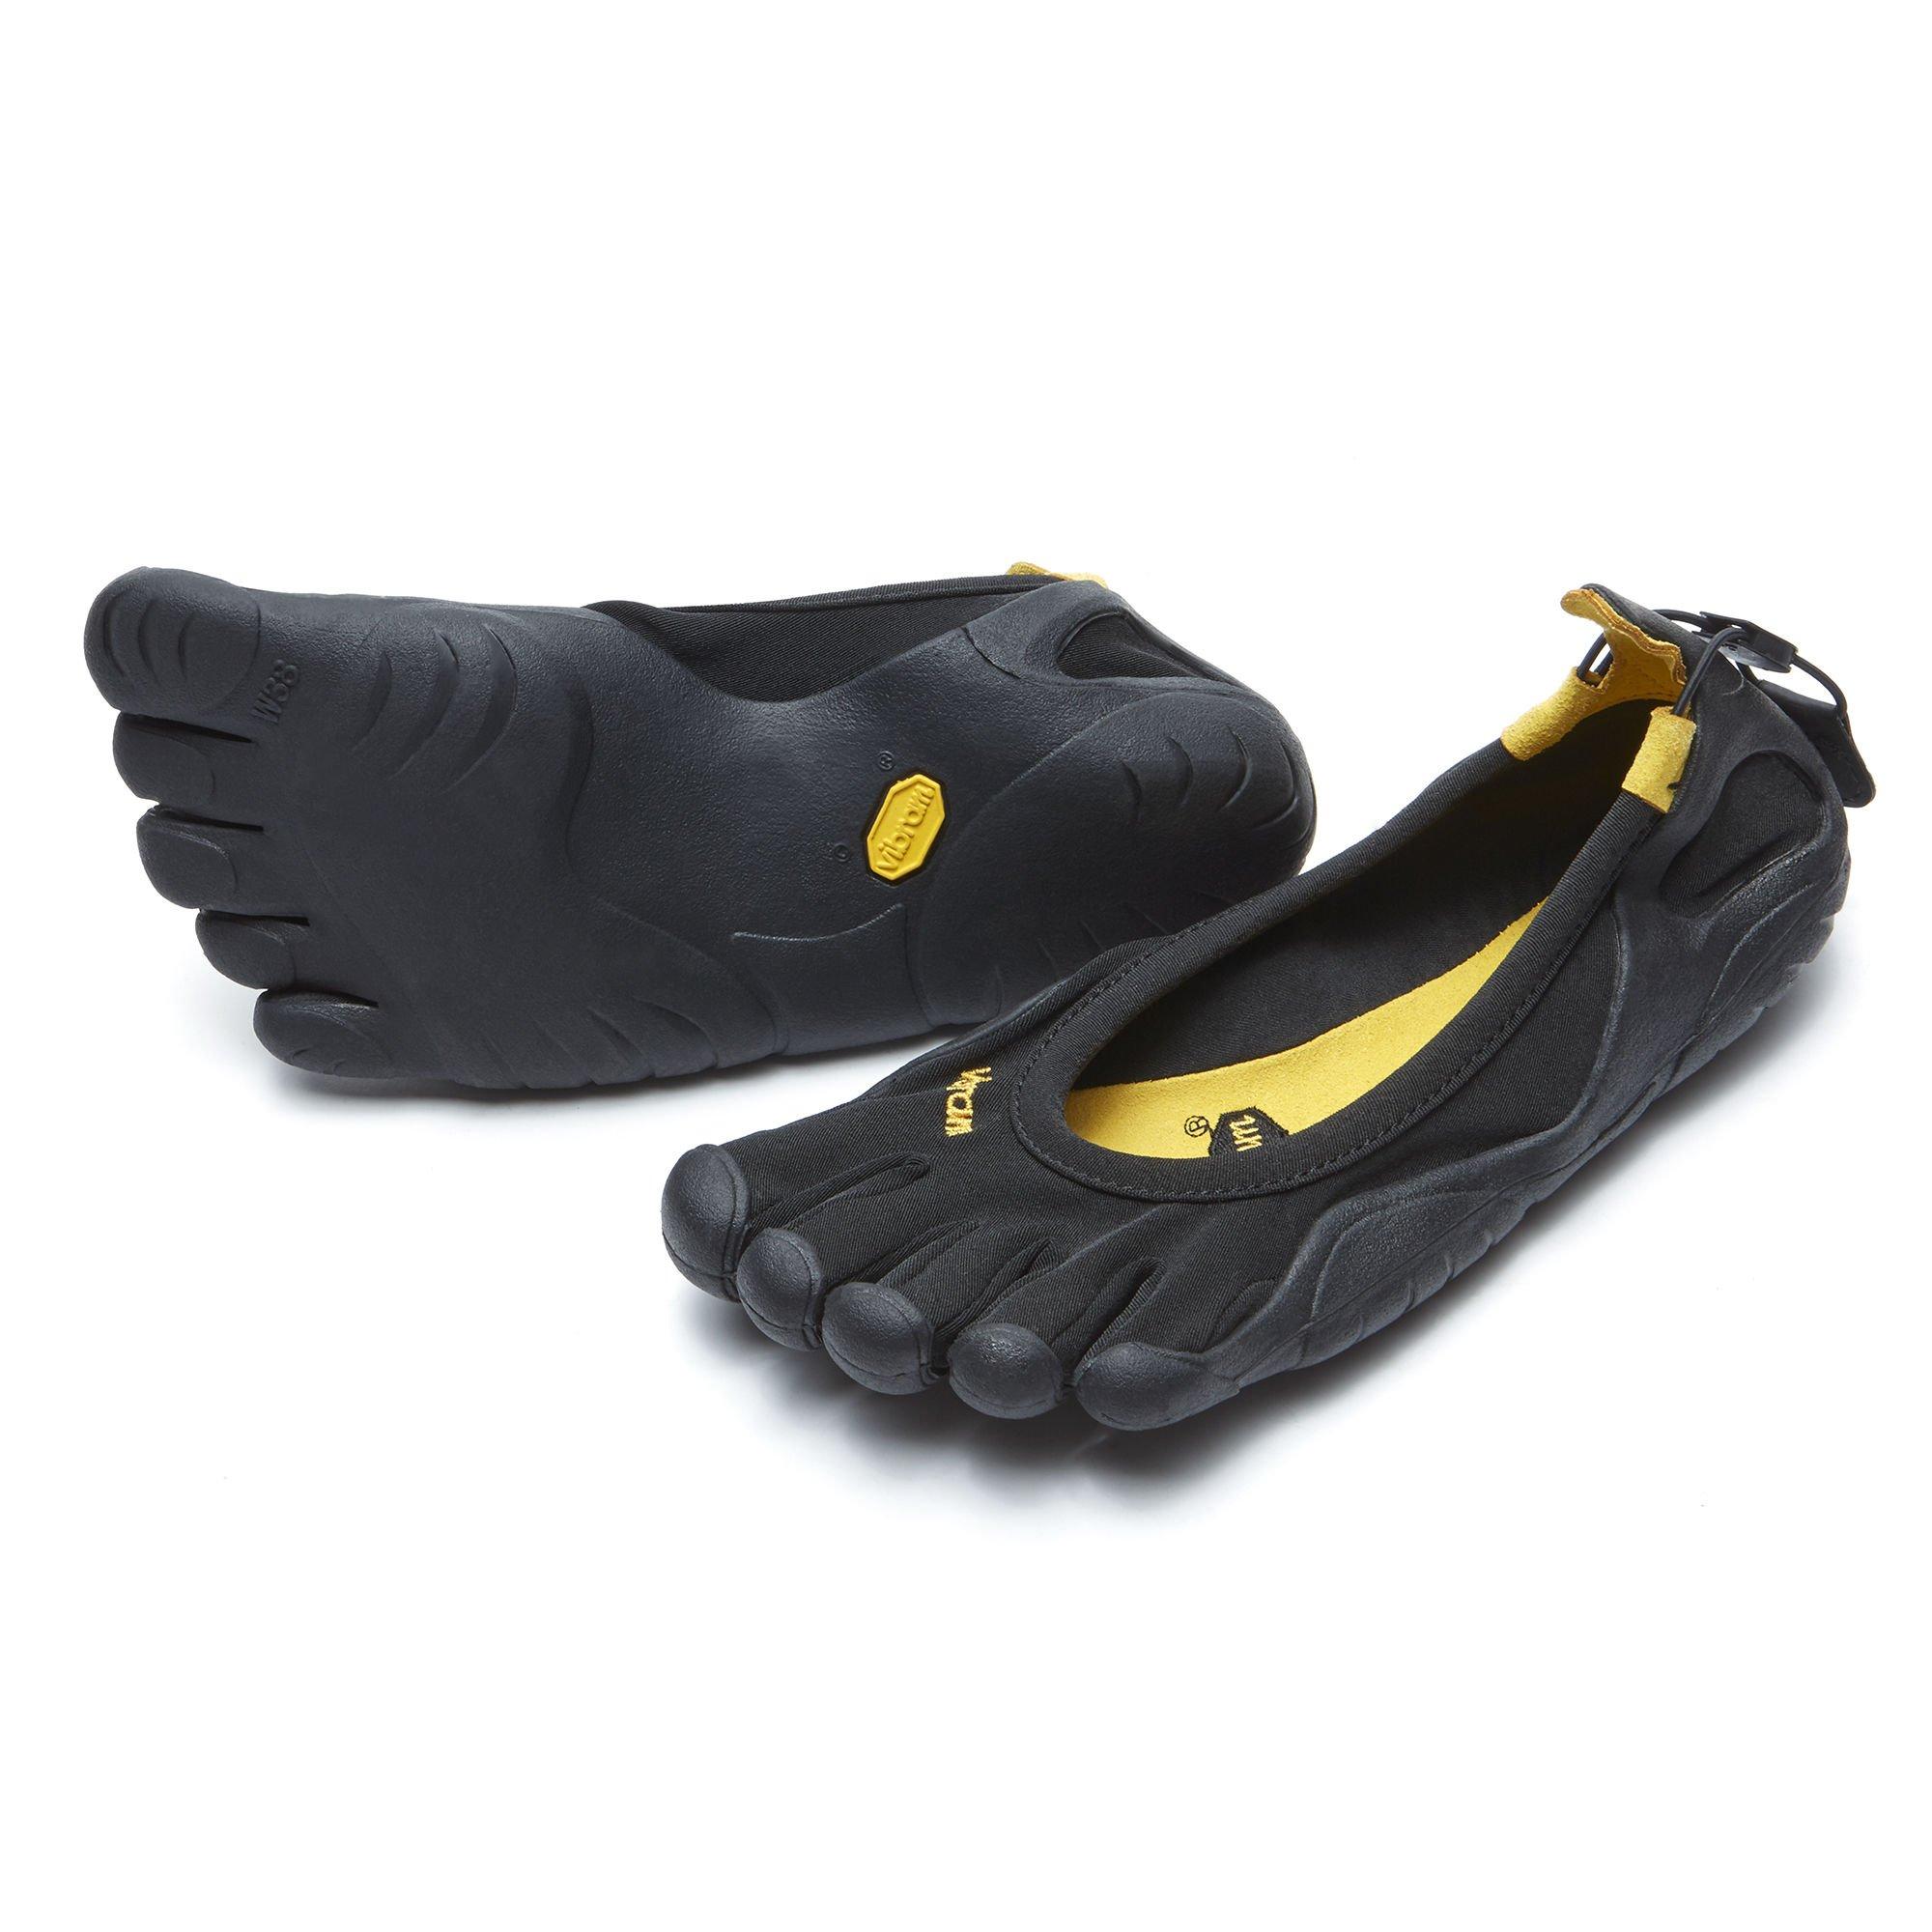 Vibram FiveFingers Women's Classic Barefoot Shoes & Toesock Bundle